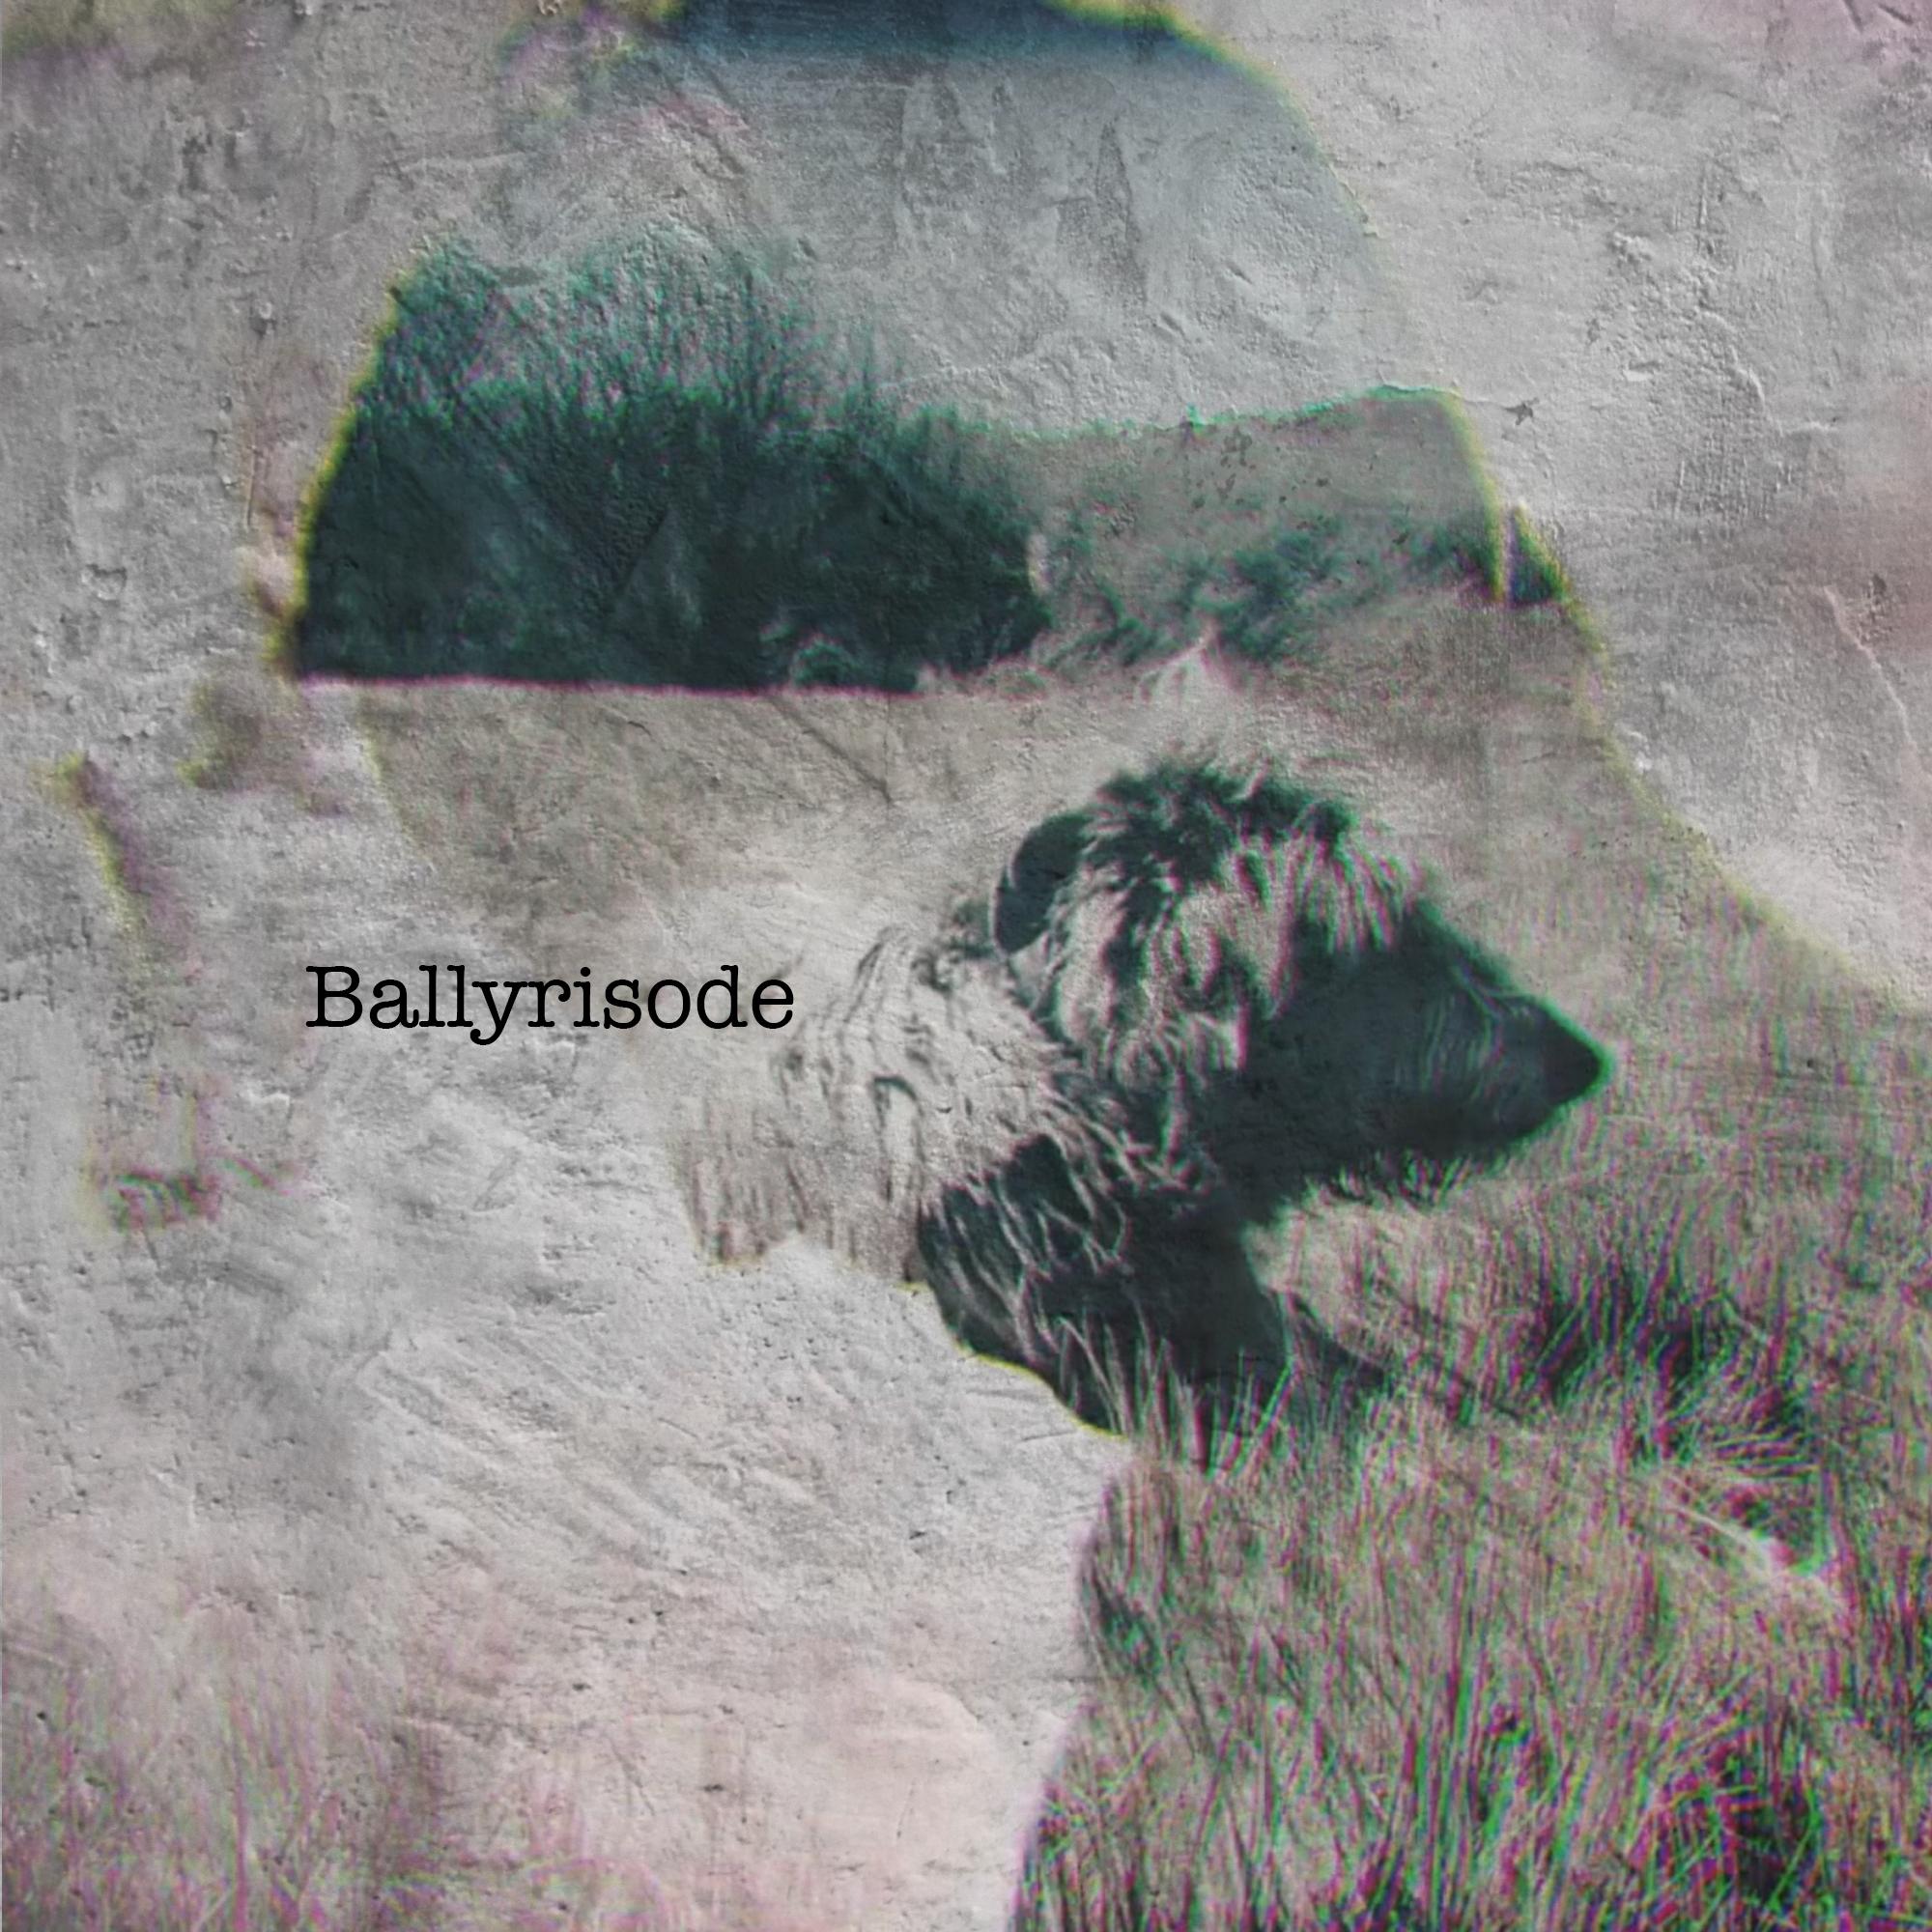 ballyrisode_image.jpg